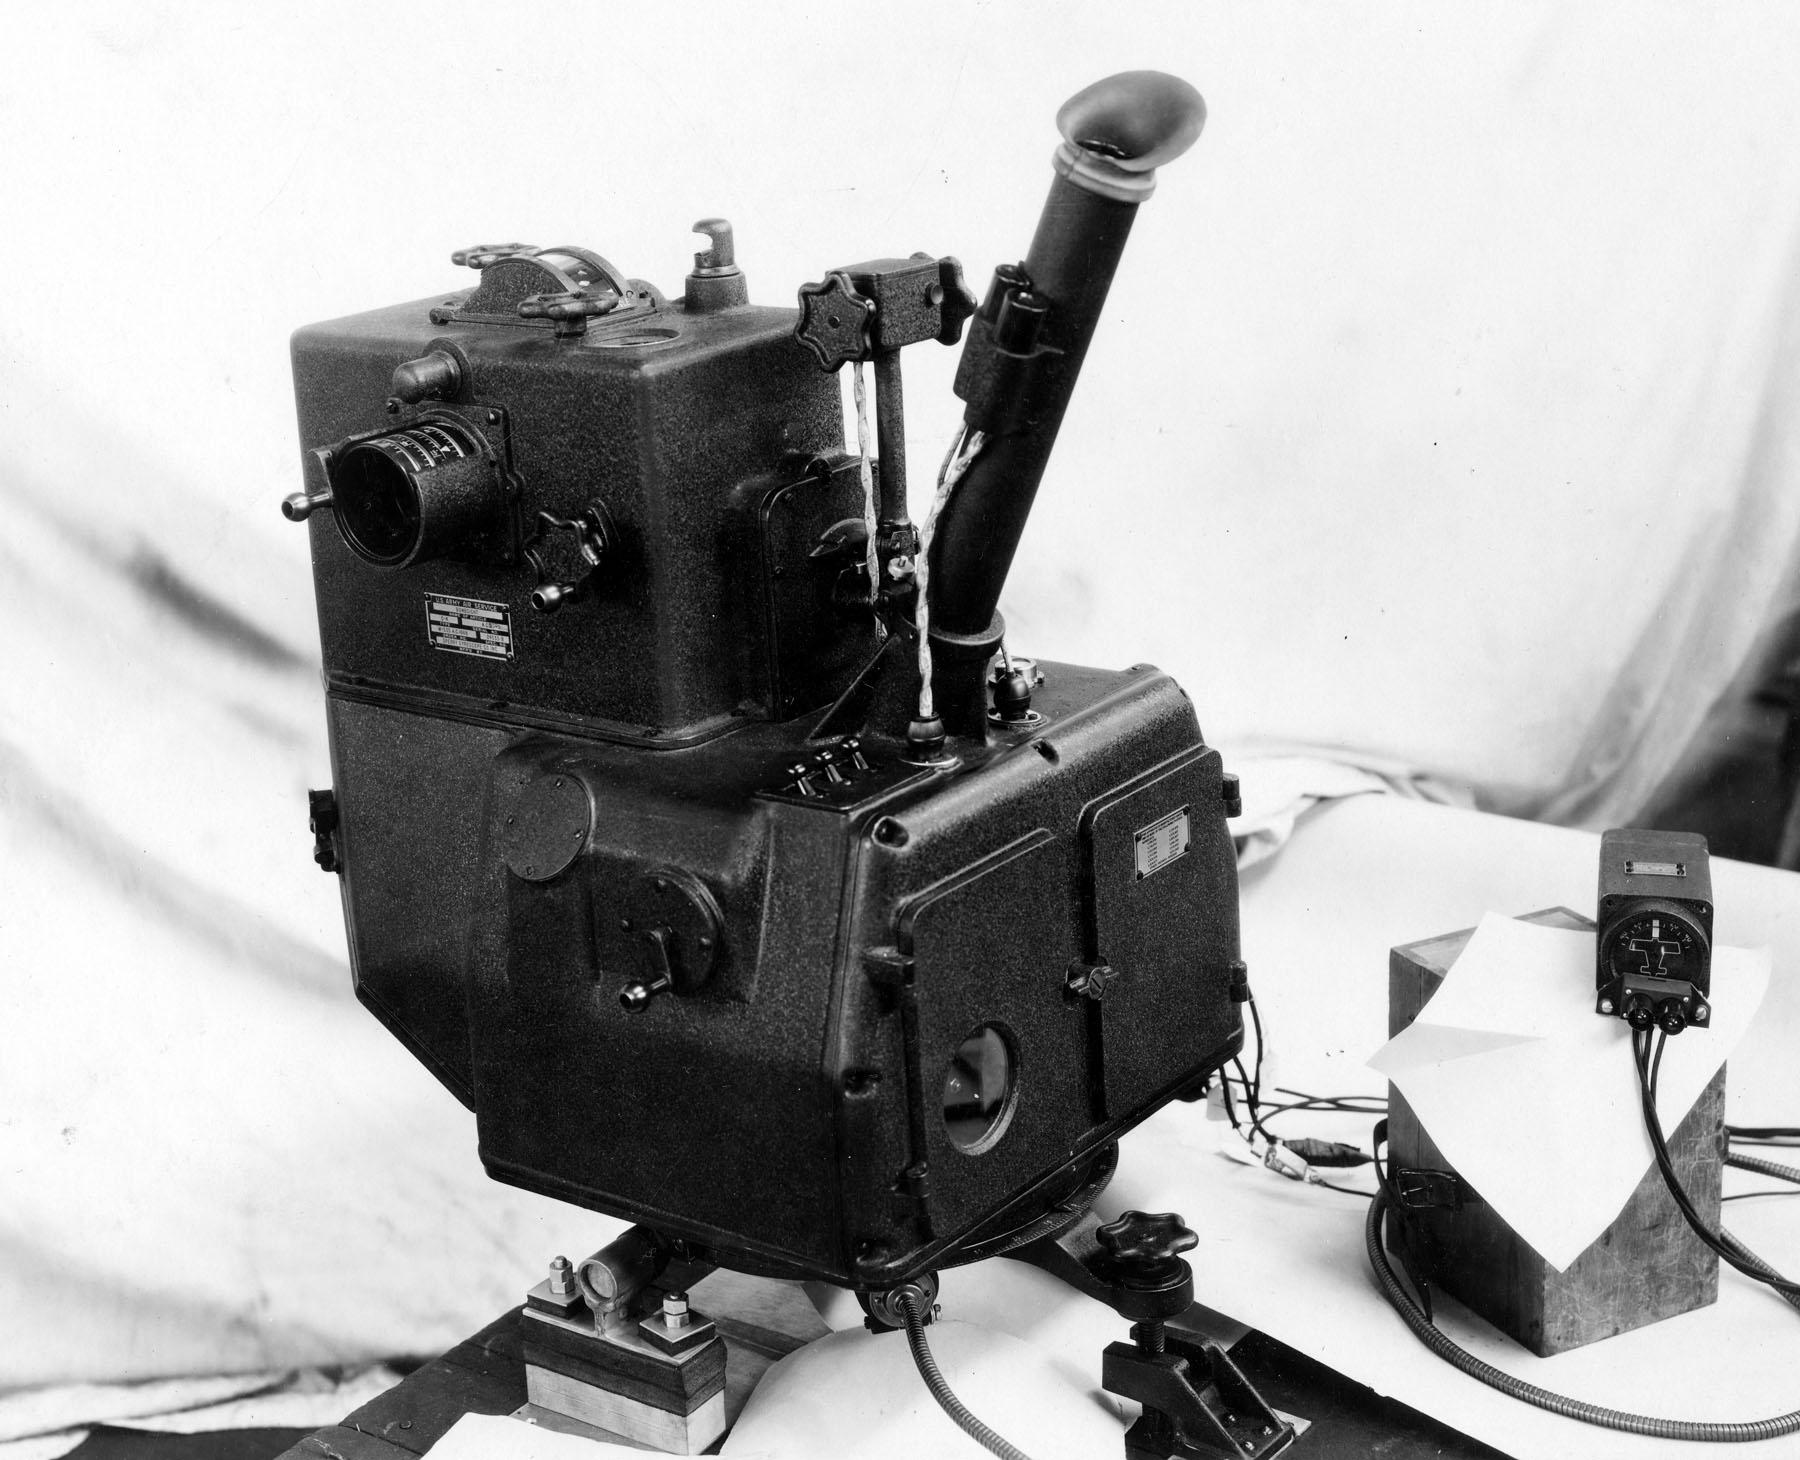 Norden bombsight manual